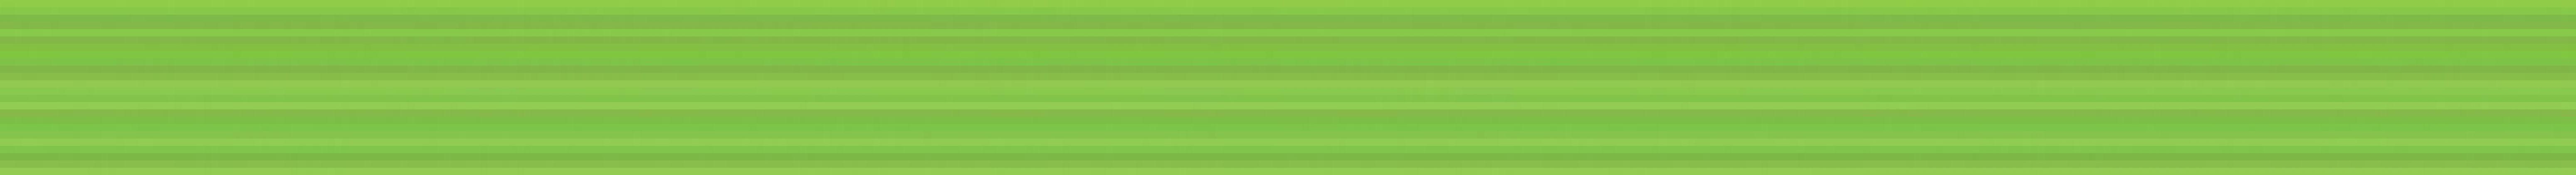 Line Бордюр стеклянный Green Strokes 2x30